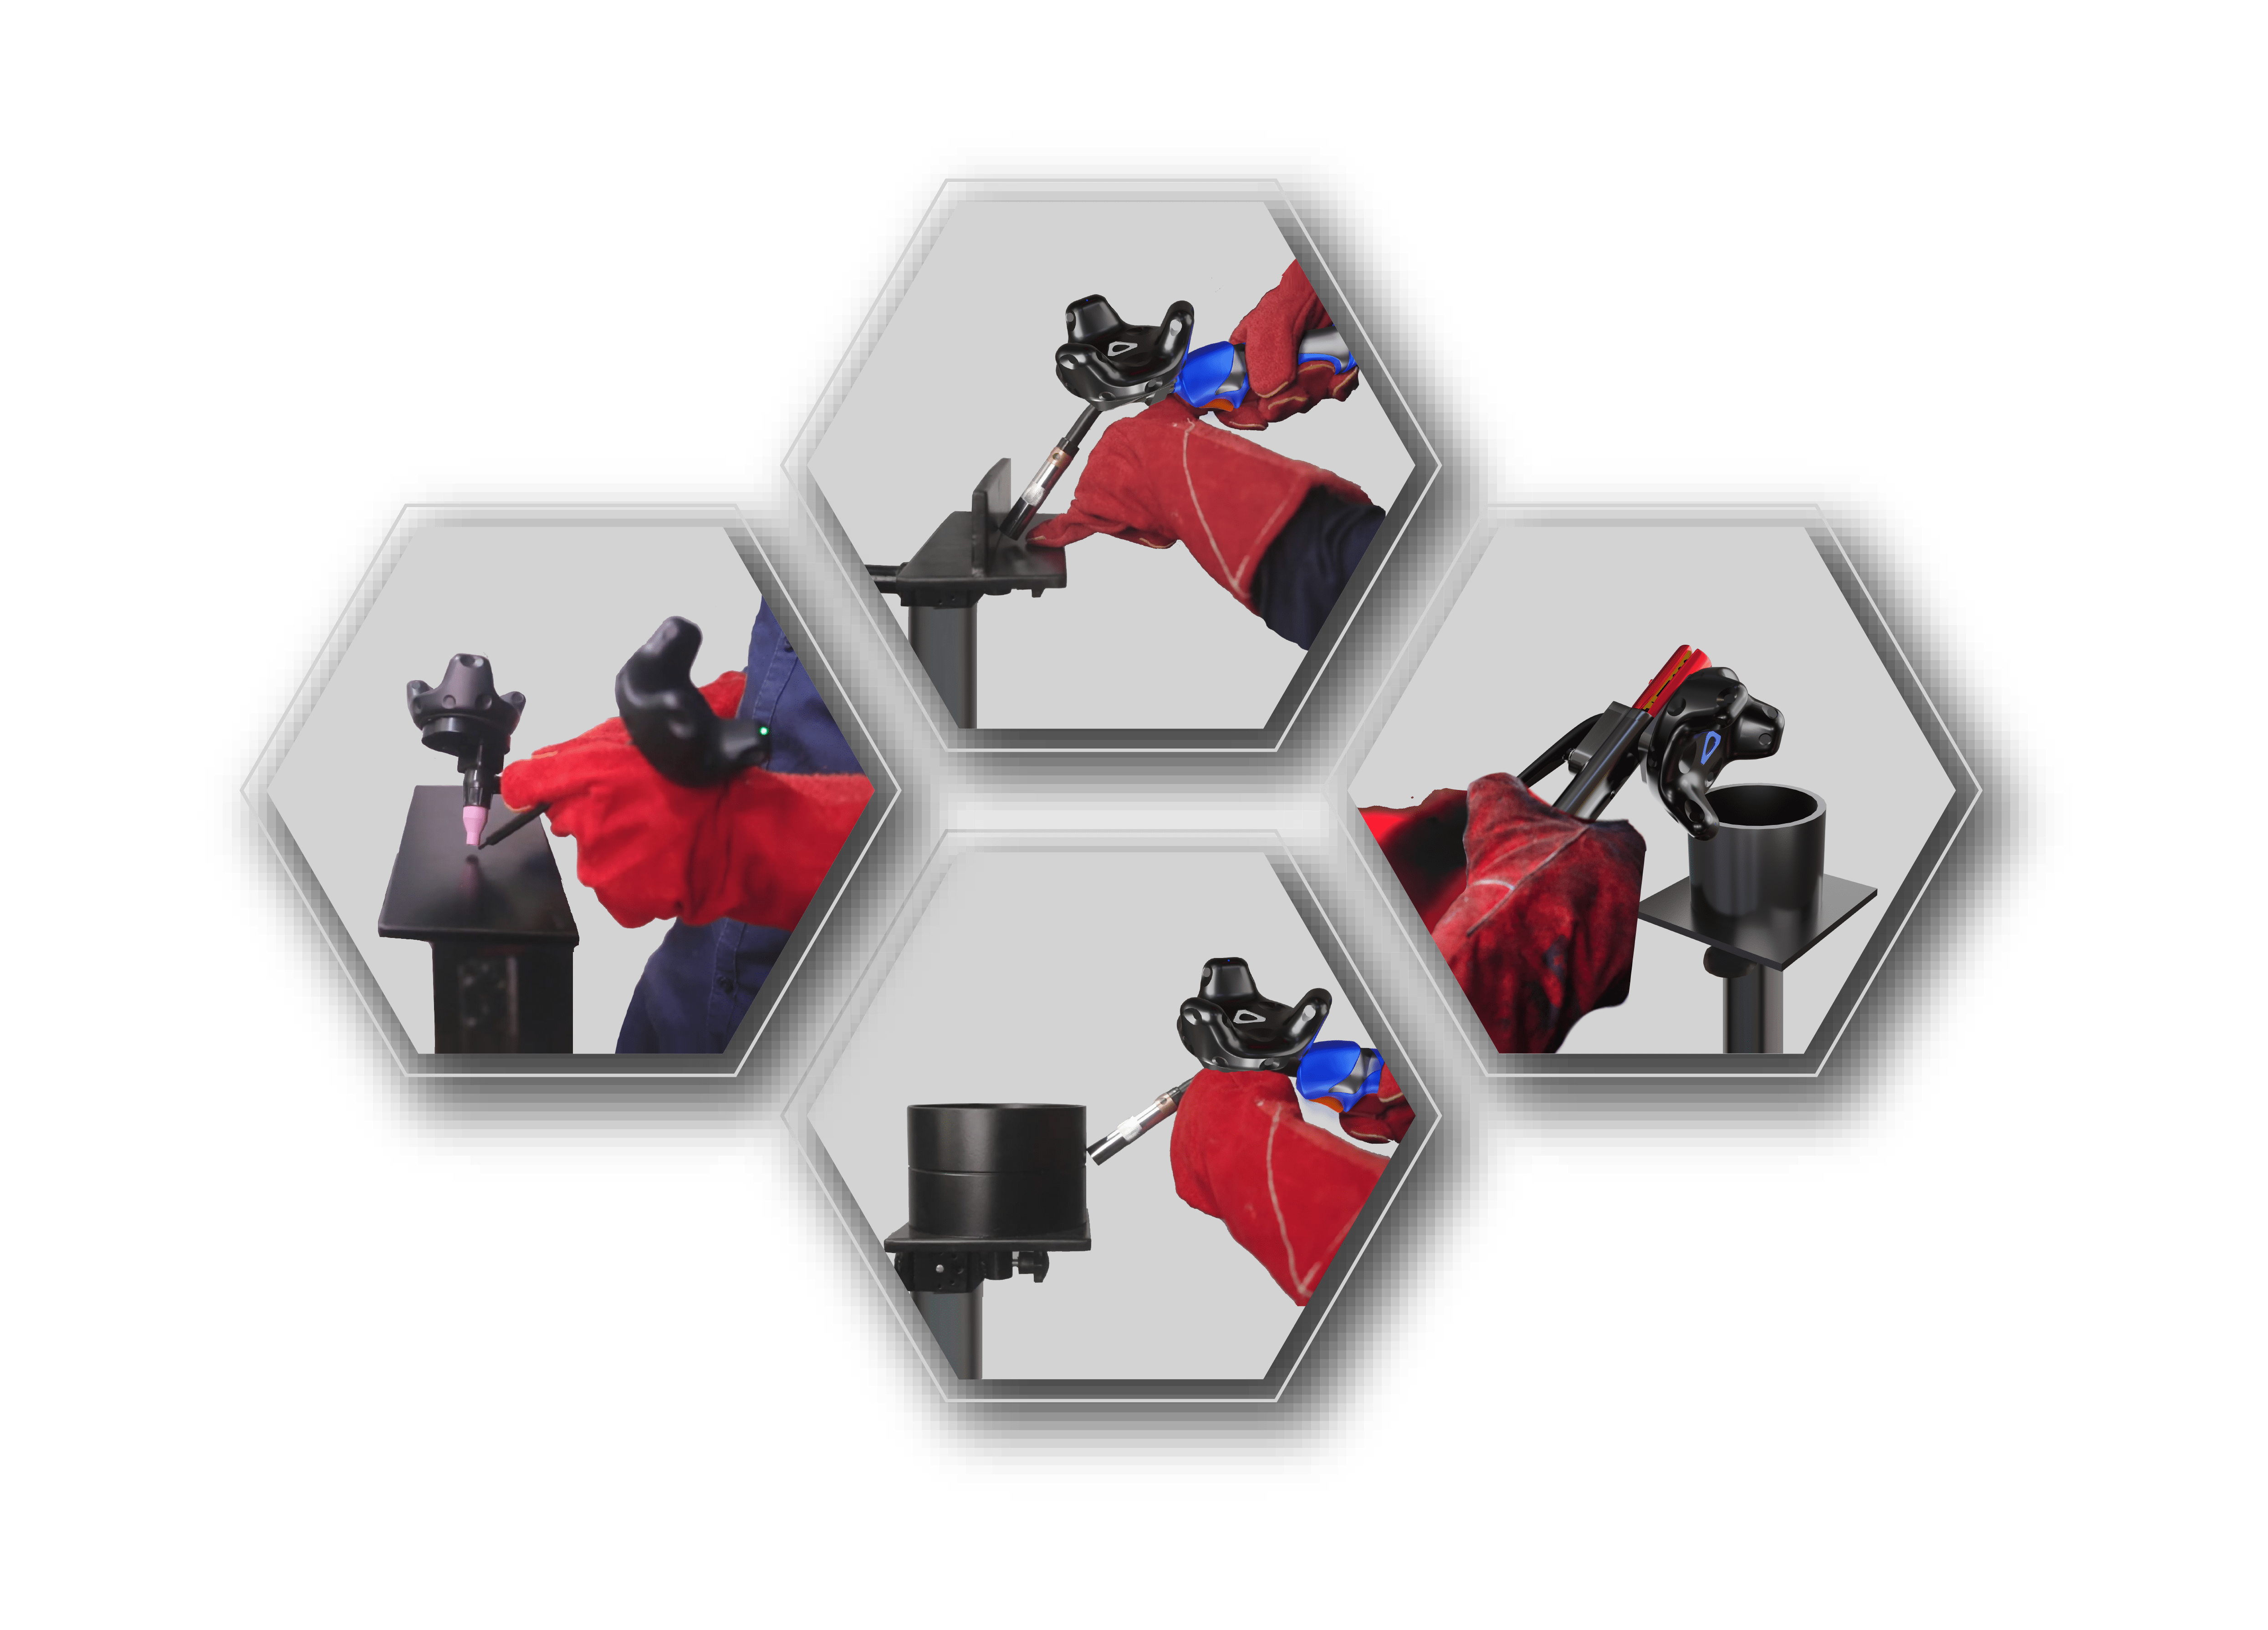 welding-simulator-hardware-img-mobile